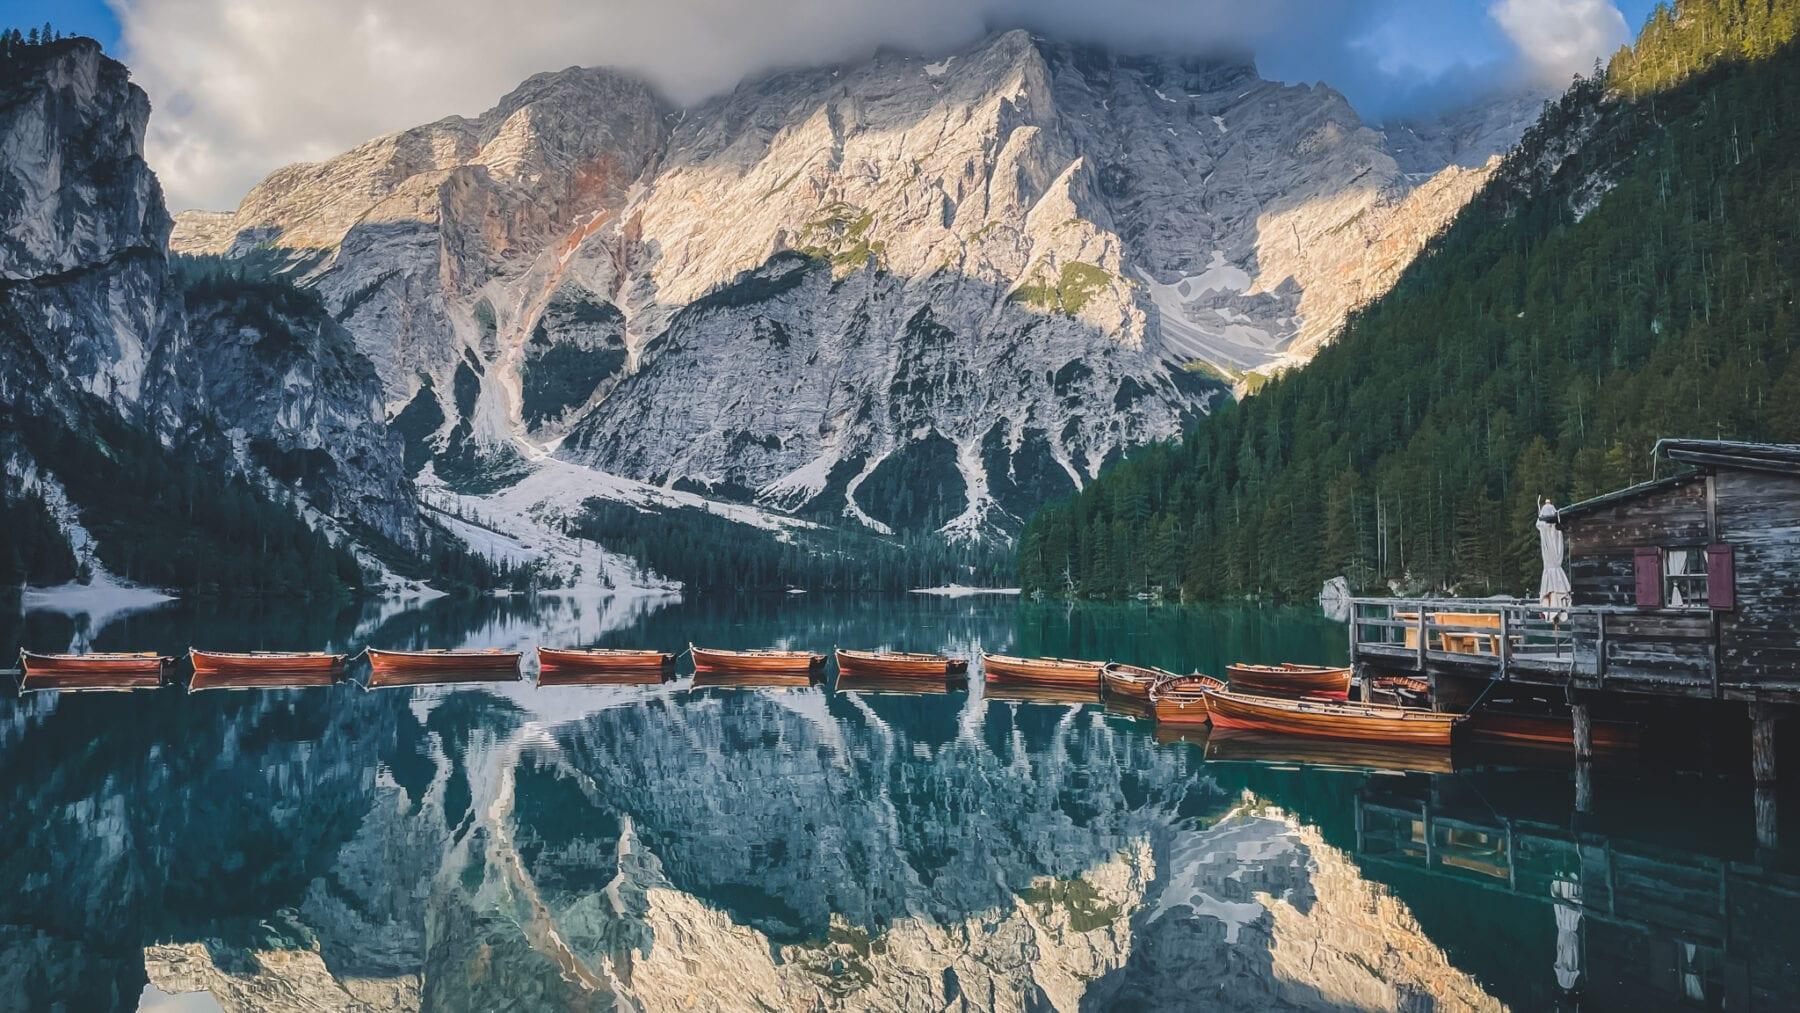 Pragser Wildsee-Via Alpina trail